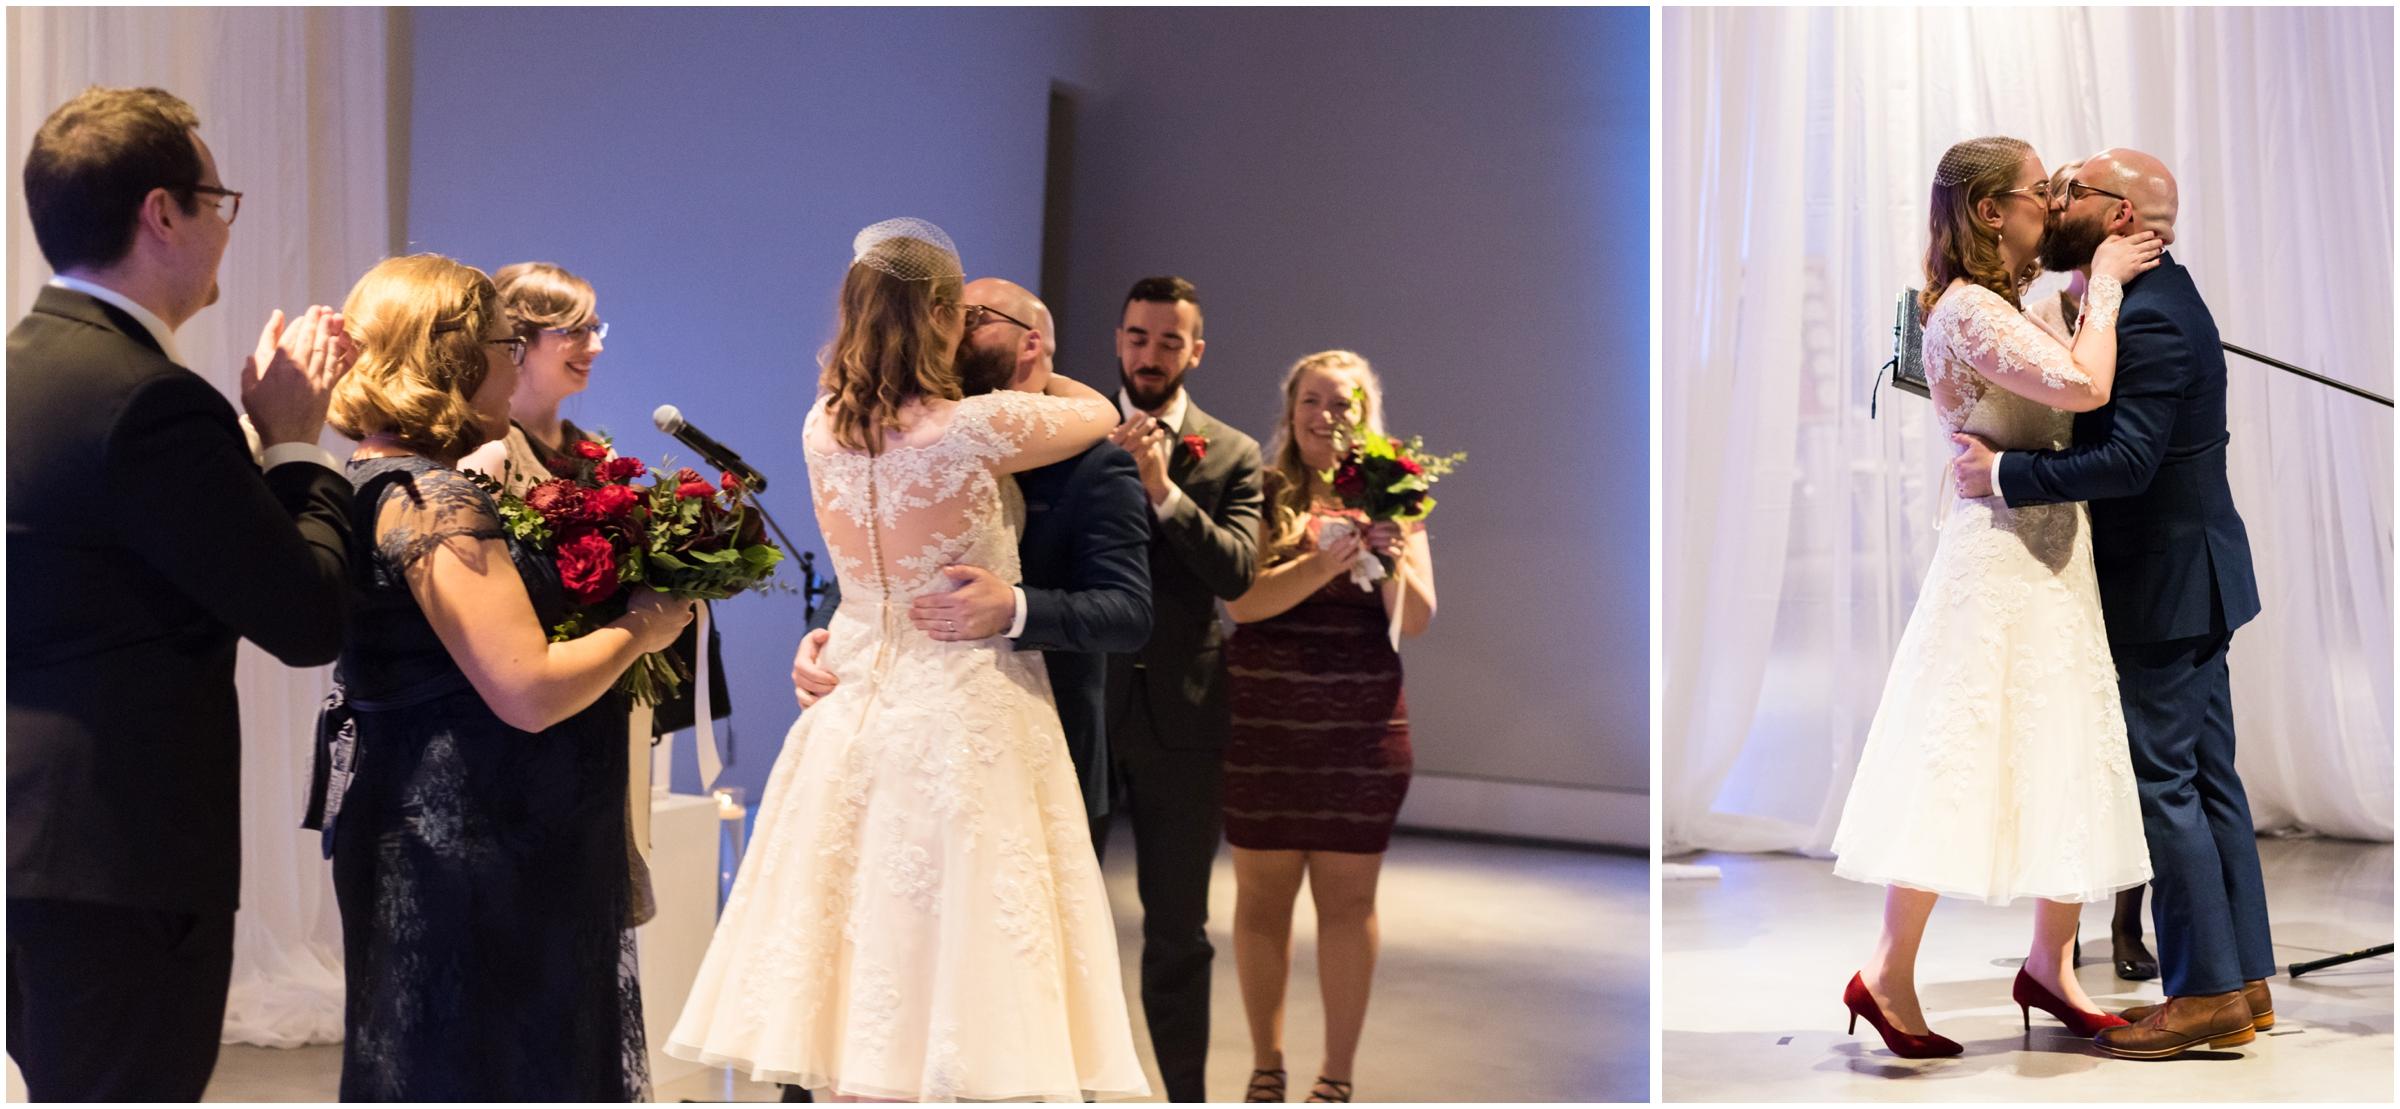 Ottaw Wedding Allison Andrew - (Selena Phillips-Boyle)_0076.jpg